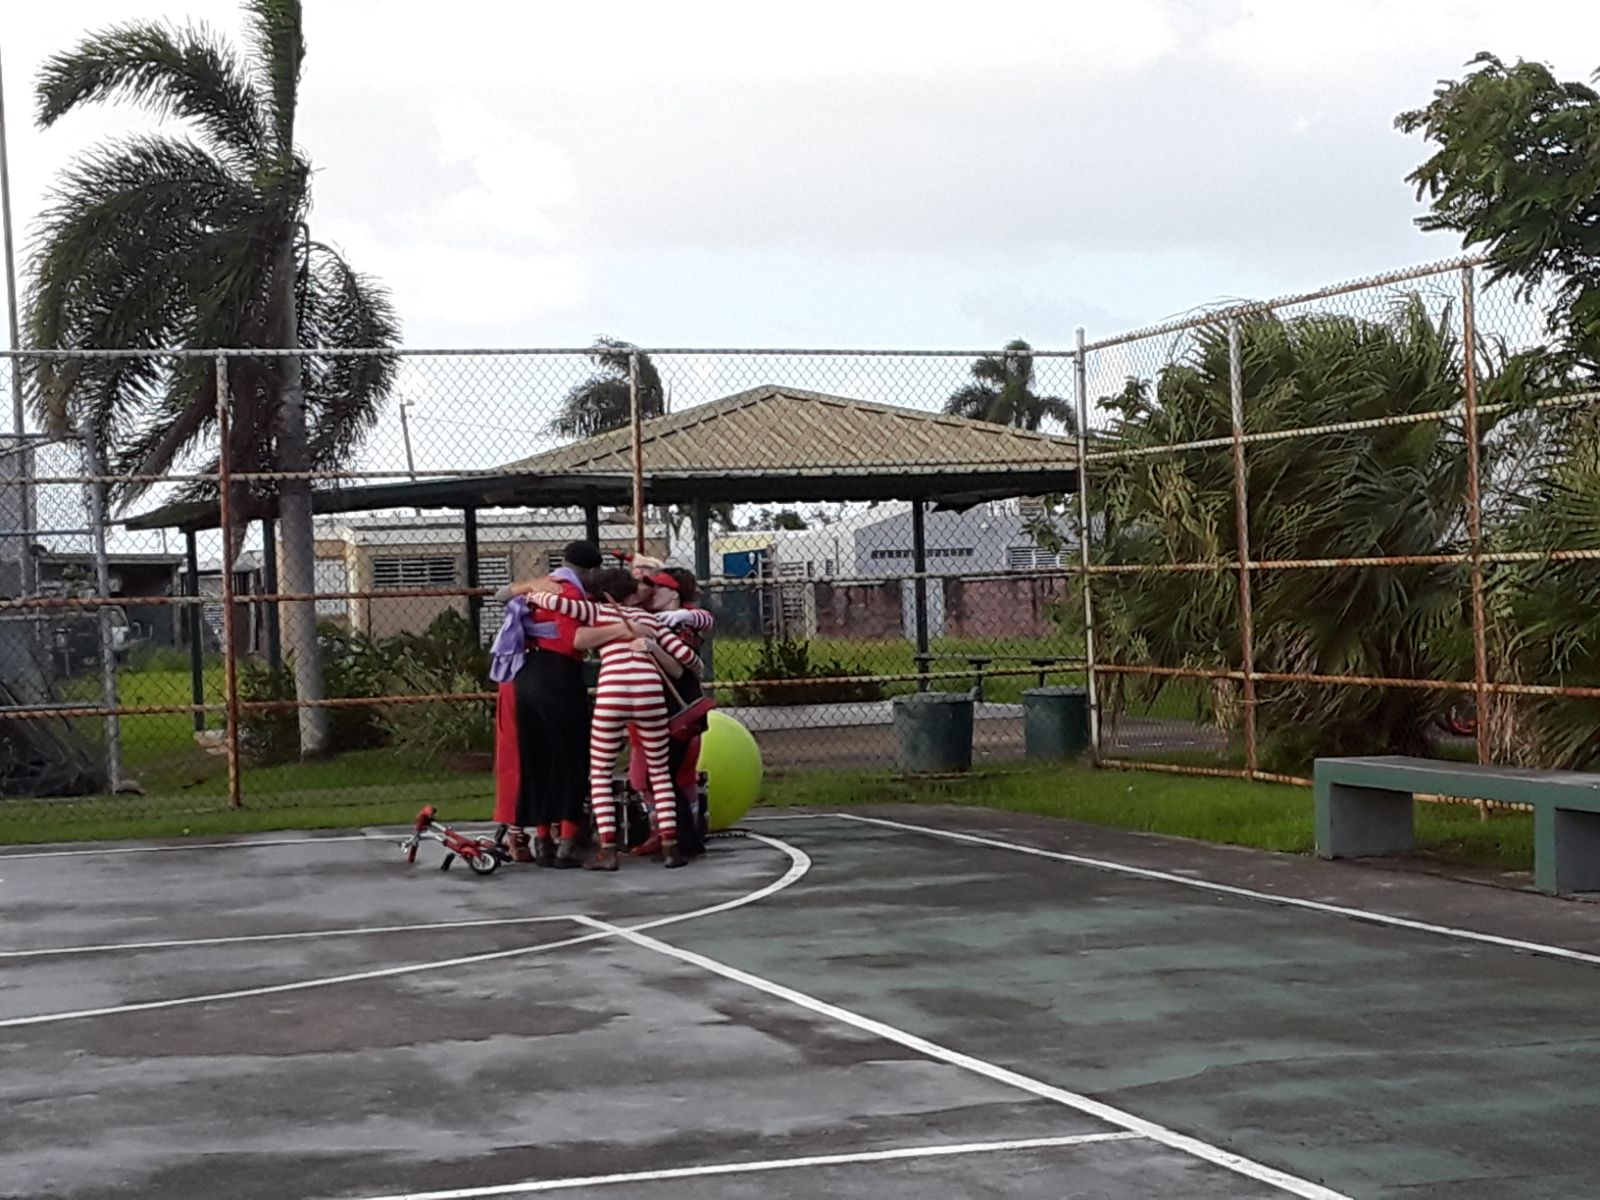 The team hugs in Puerto Rico